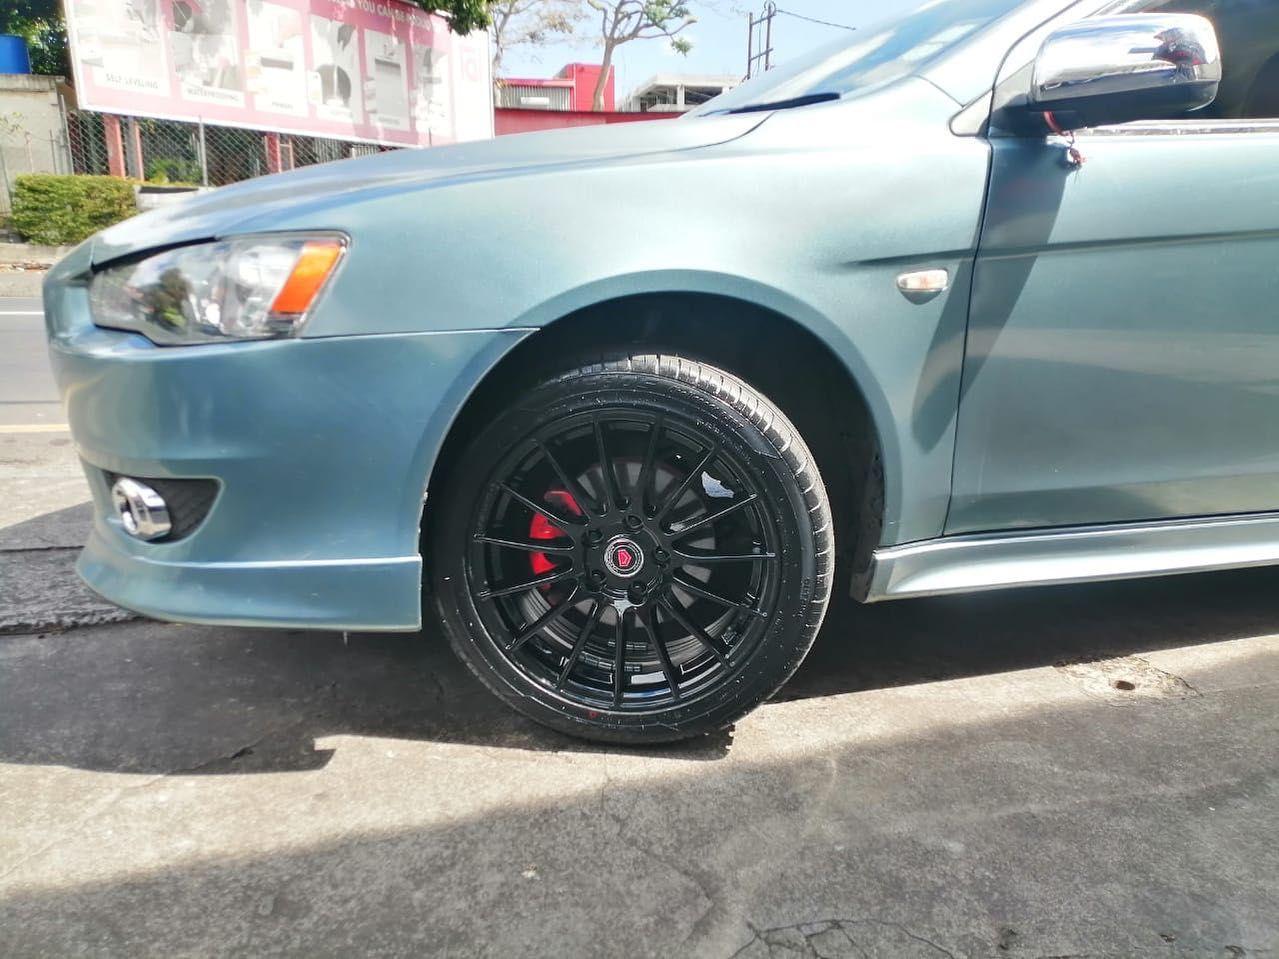 Alloy Wheels 17 Installed On Mitsubishi Lancer Ex In 2020 Mitsubishi Lancer Mitsubishi Lancer